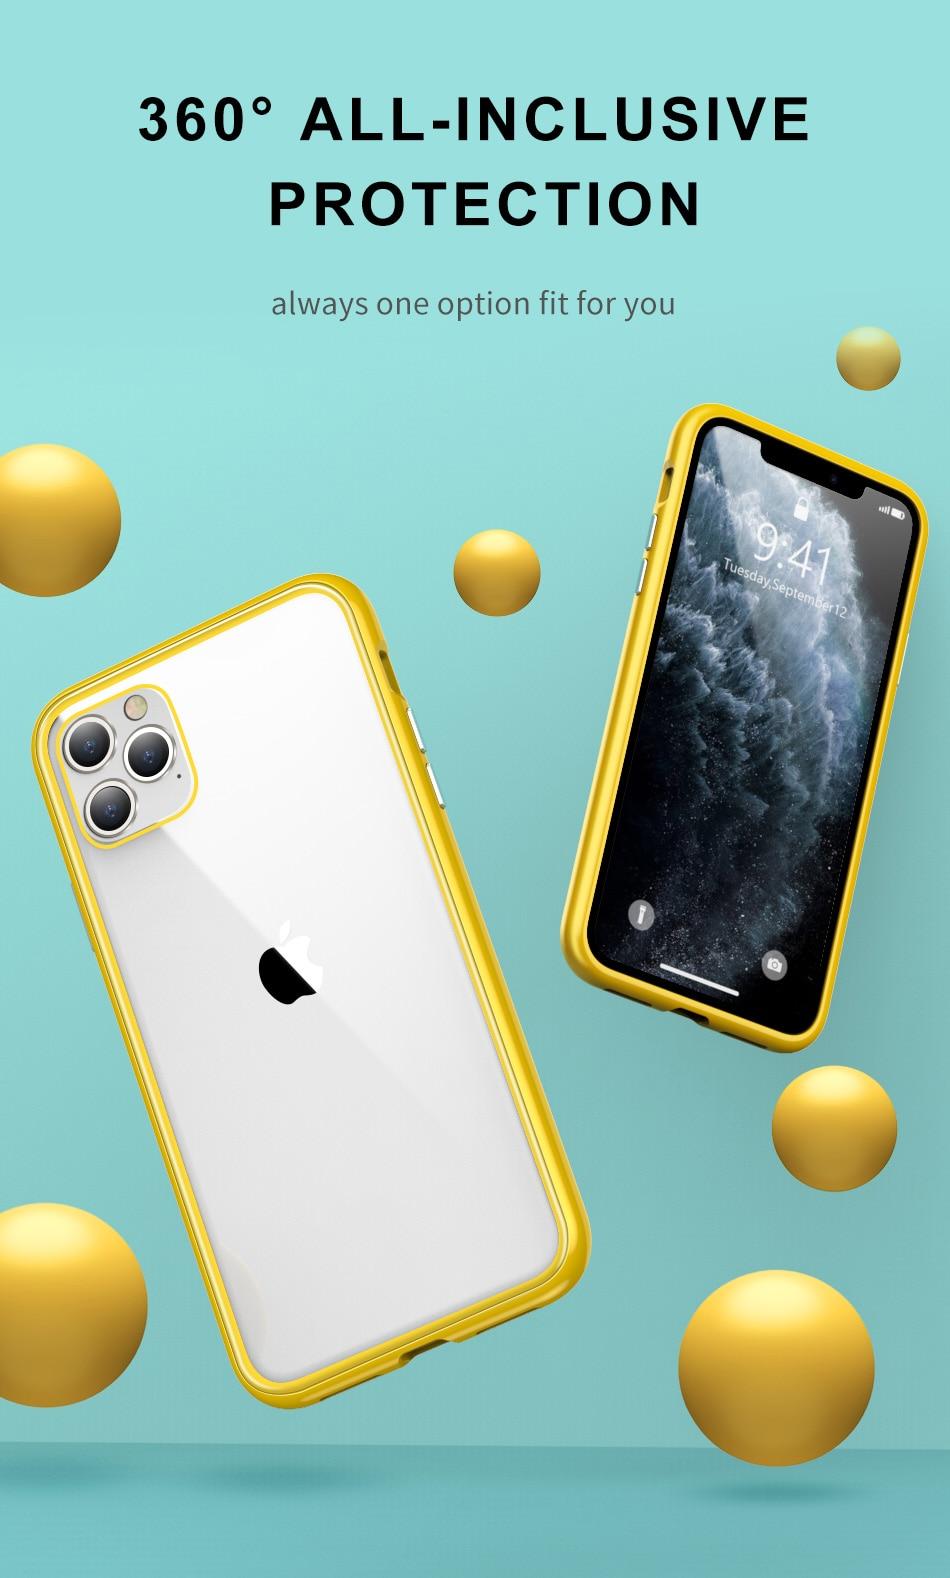 506AH1285-for-iphone-11-Pro_马卡龙透明万磁王-950_05